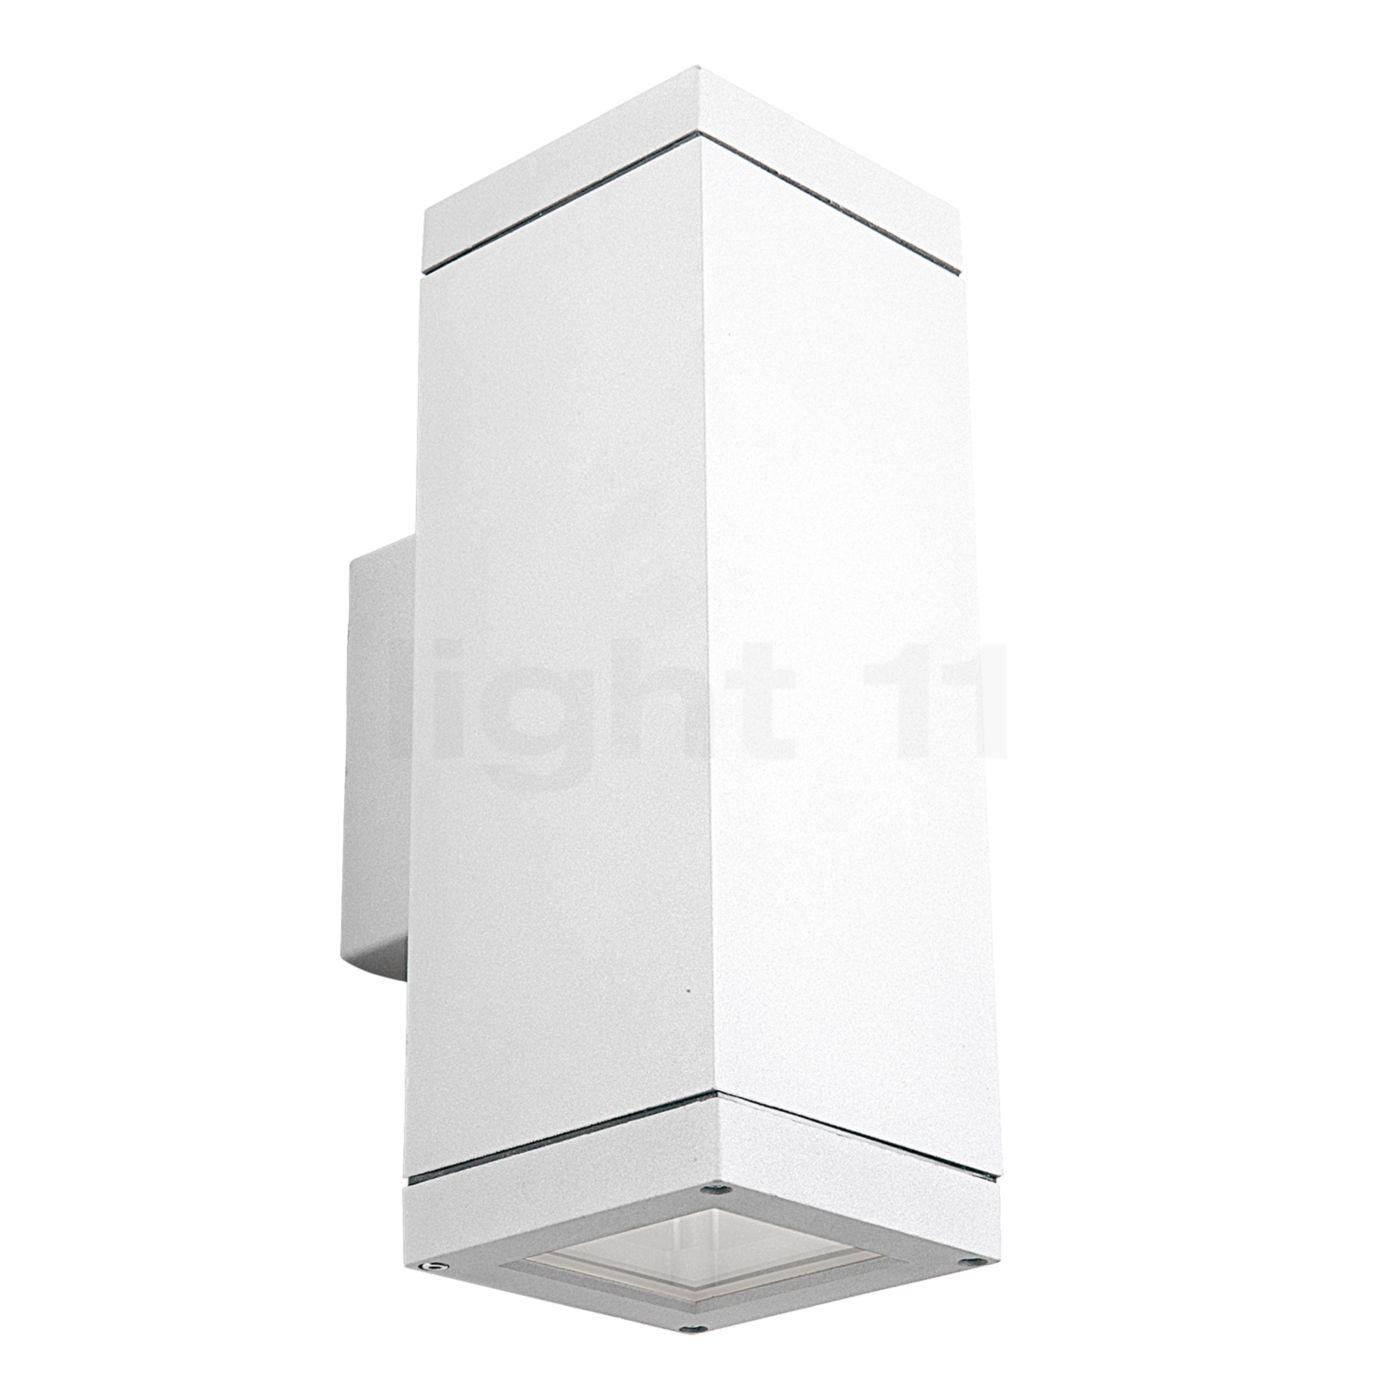 Afrodita_PAR_30_Up__Down_Vaeglampe_hvid--0e7c41dba35d5b0cbf53e60fe3a5dce0 Faszinierend Up Down Lampe Dekorationen